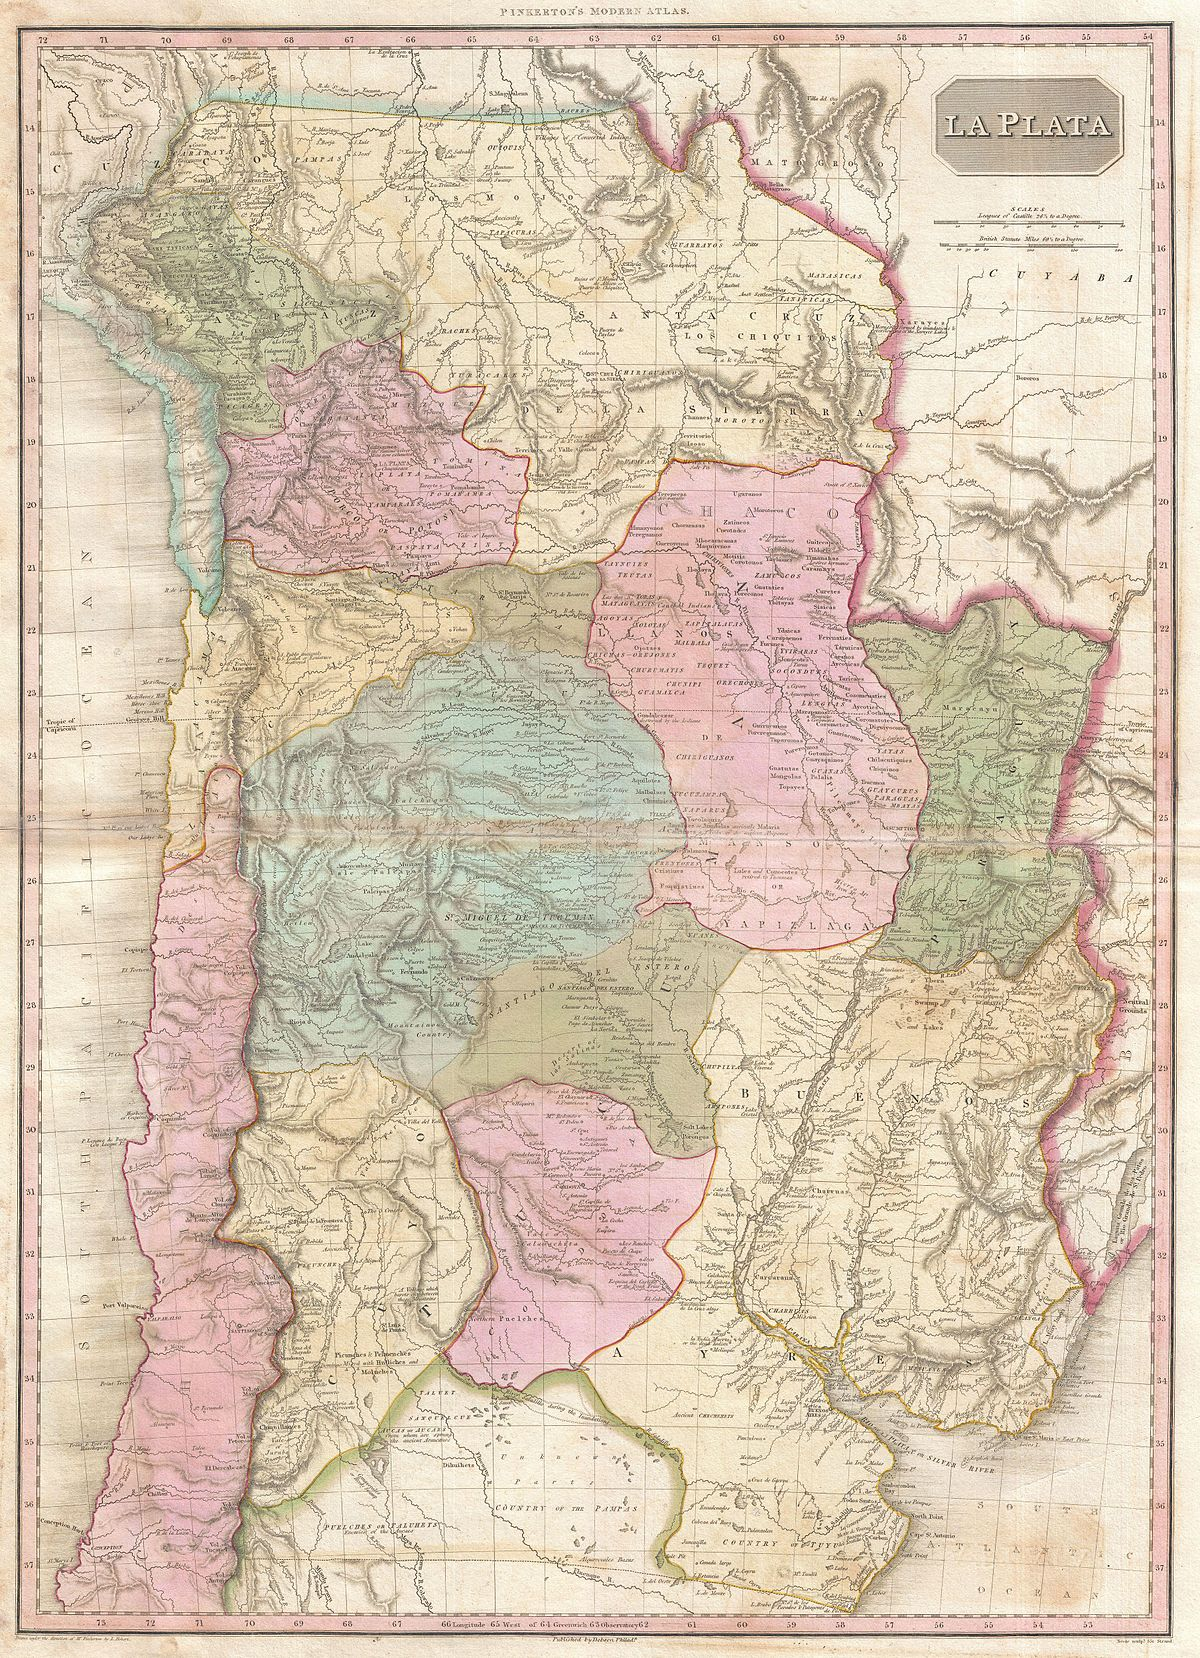 Independencia de la Argentina - Wikipedia, la enciclopedia libre